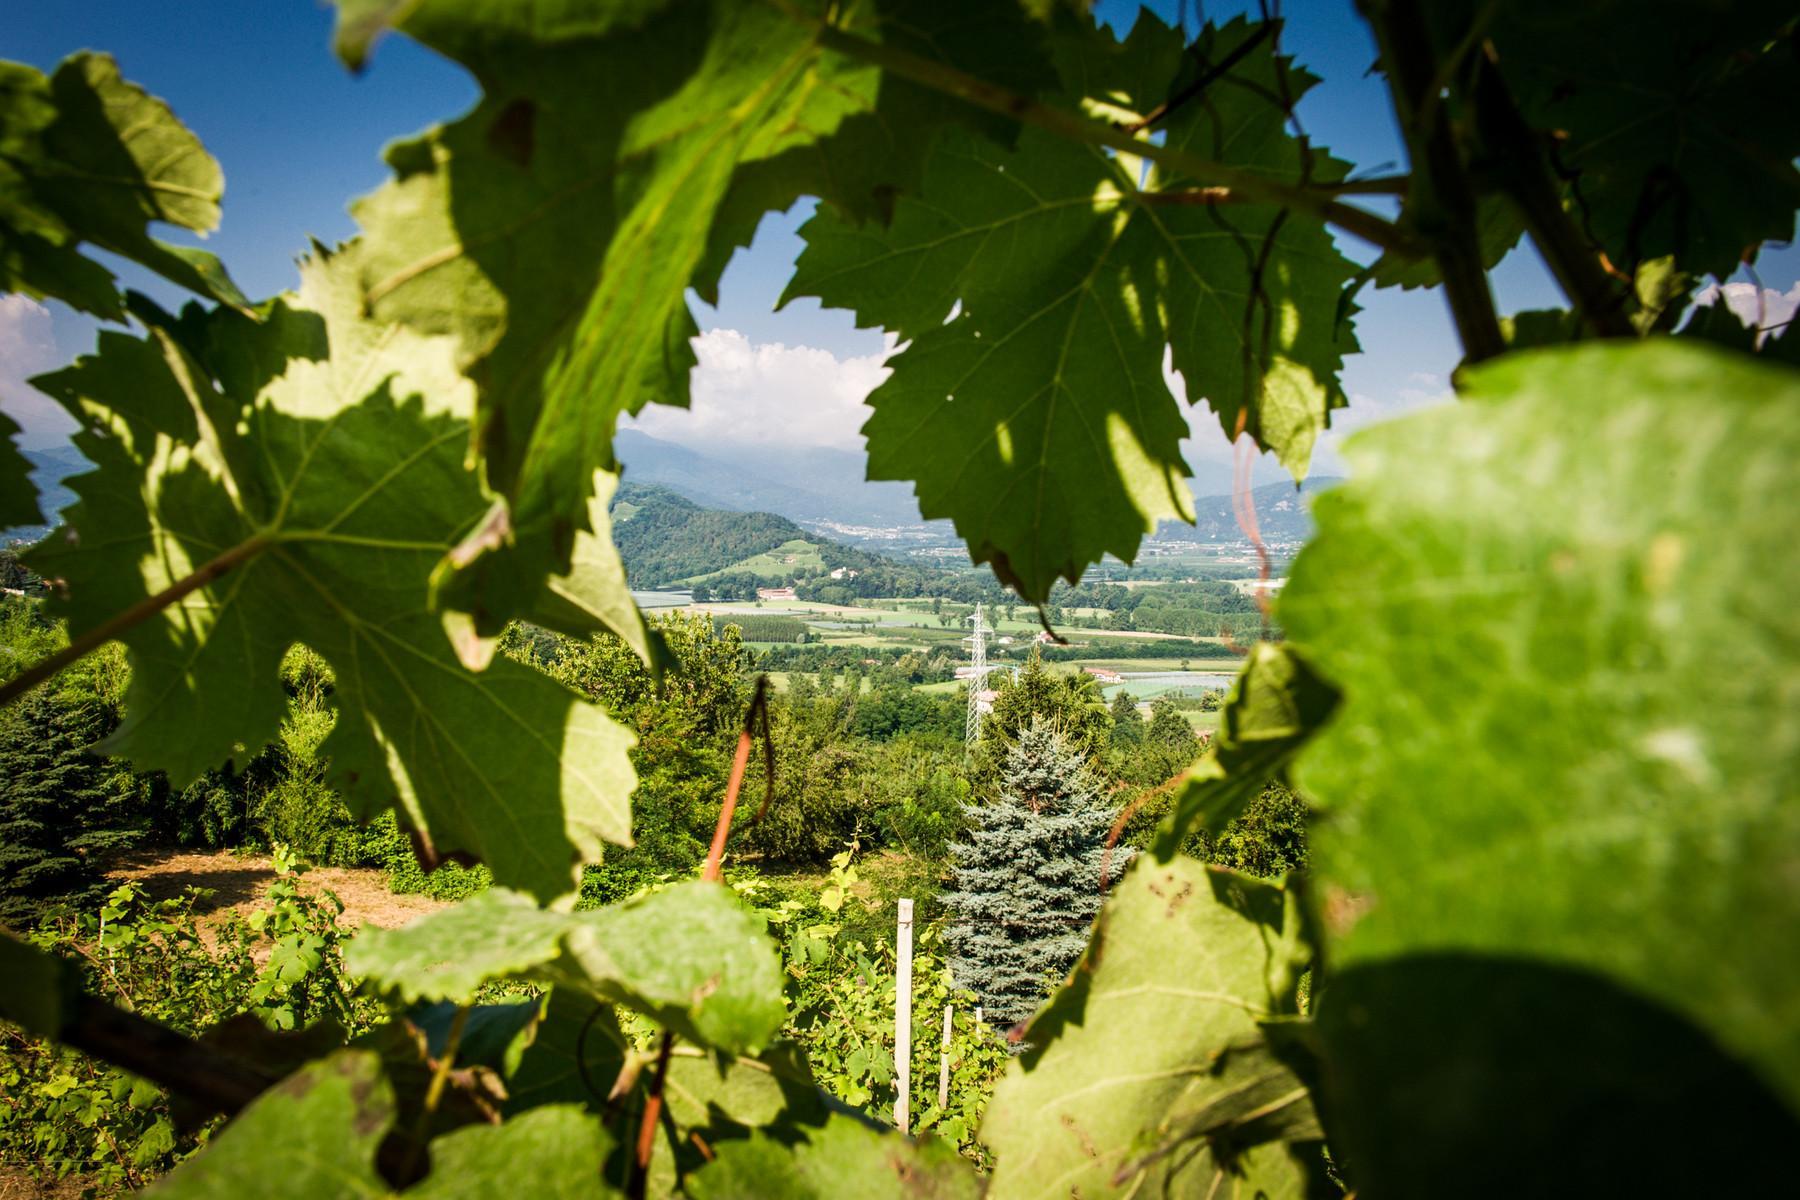 Splendid villa with winery in Piedmont - 6